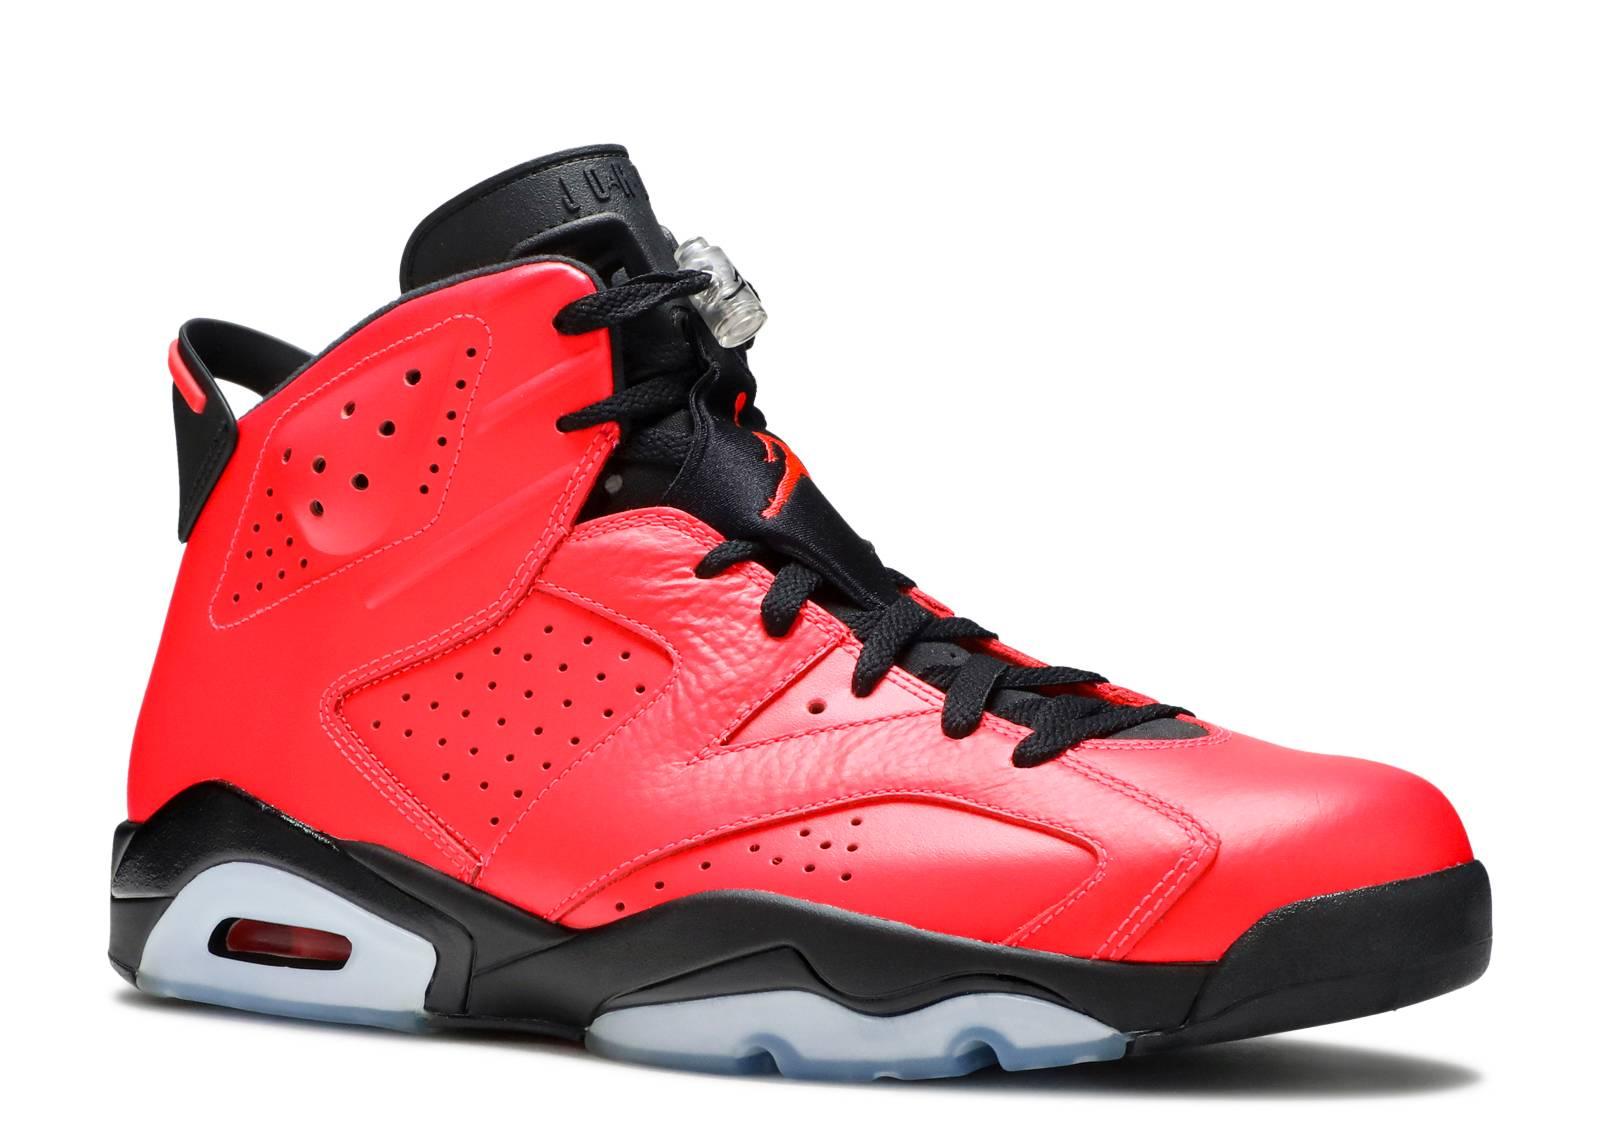 0378f0570d86c7 wholesale jordan 6 infrared 2014 infrared 23 01f35 8fc32